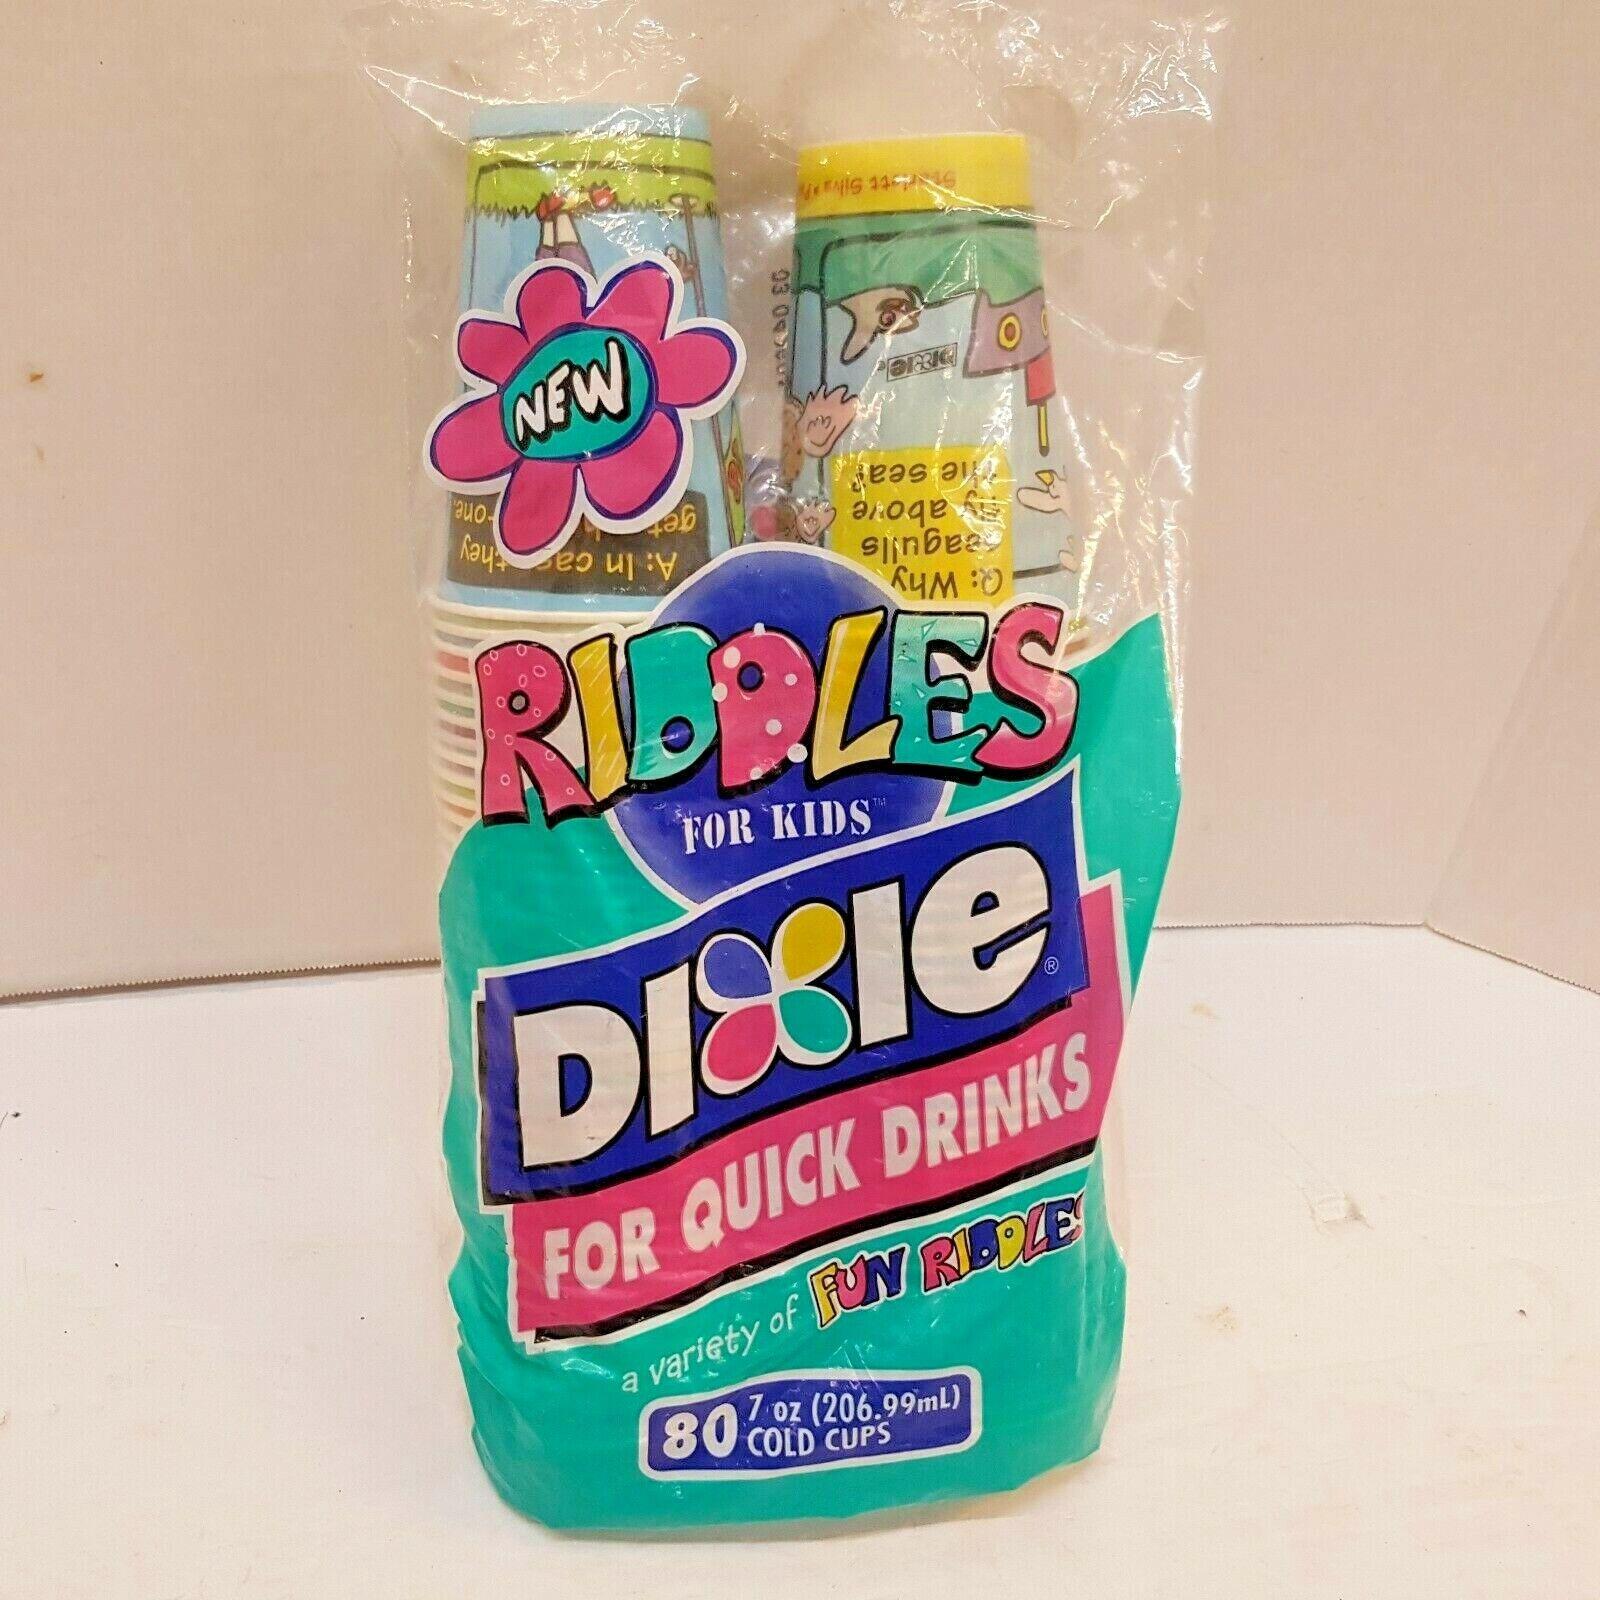 New NOS Vintage Dixie Cold Cups Riddles for Kids 80 7oz Glas